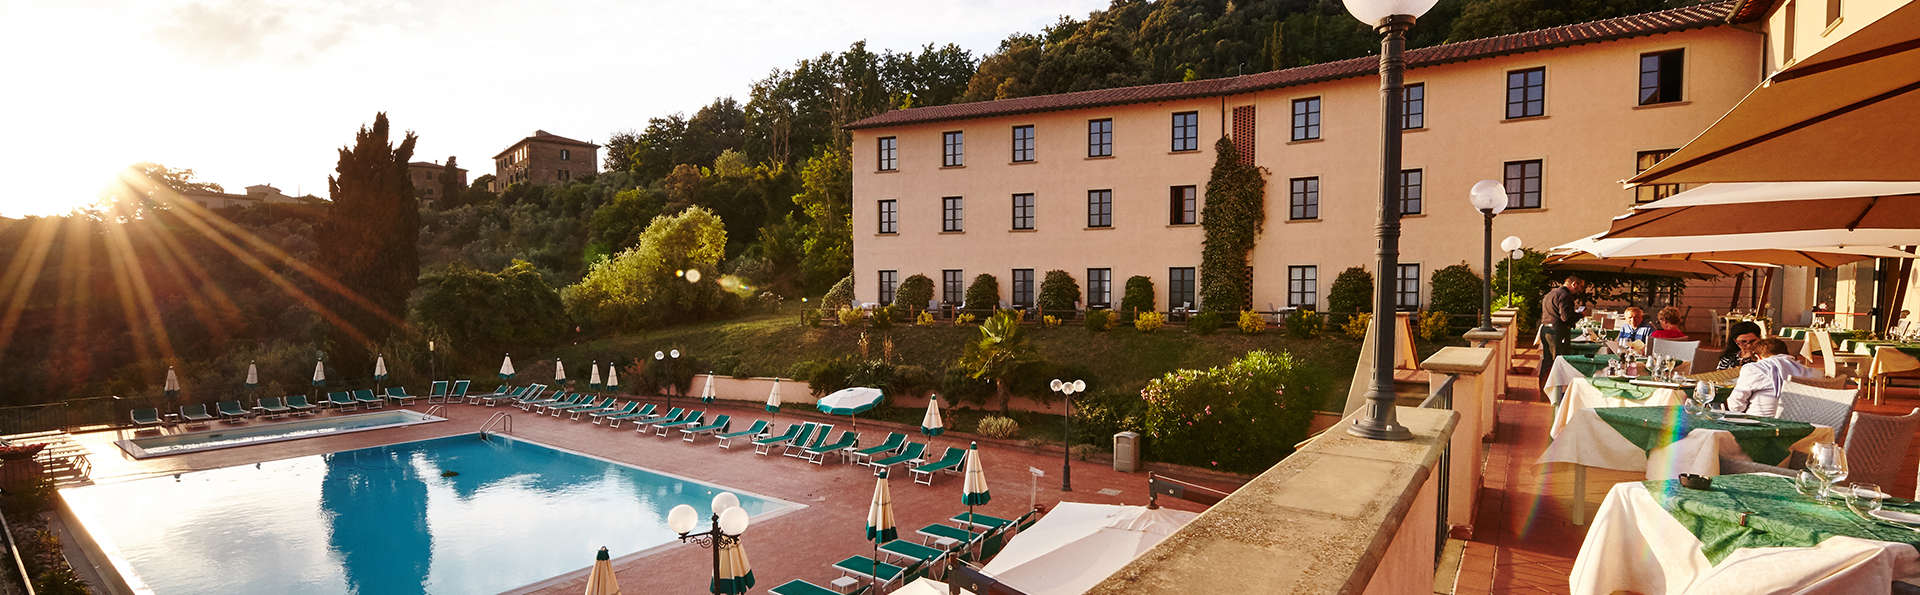 Park Hotel Le Fonti - edit_pool_terras.jpg